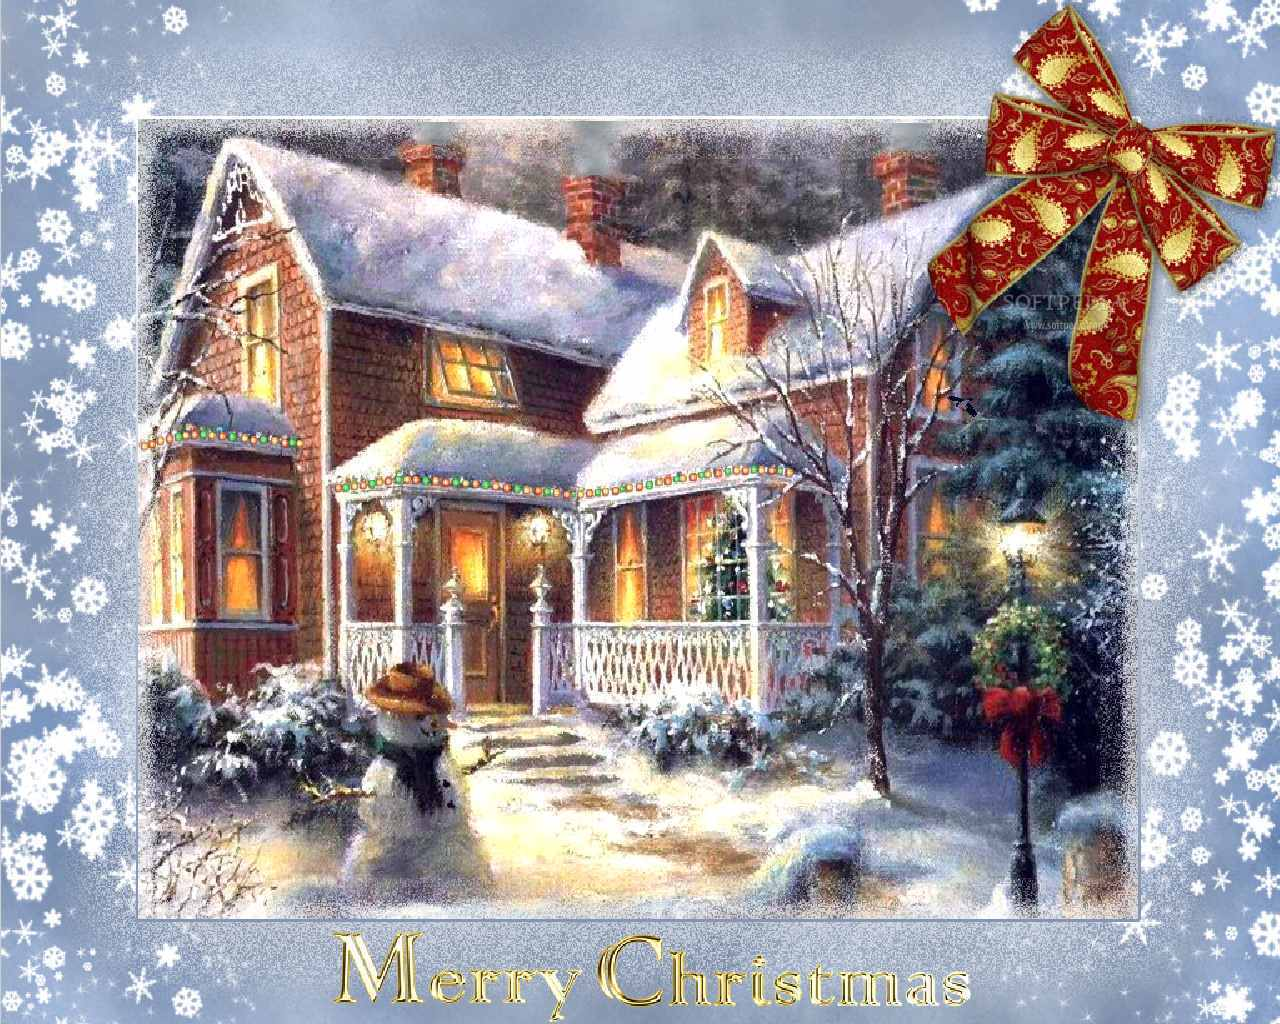 Christmas Wallpaper   Christmas Wallpaper 2624790 1280x1024